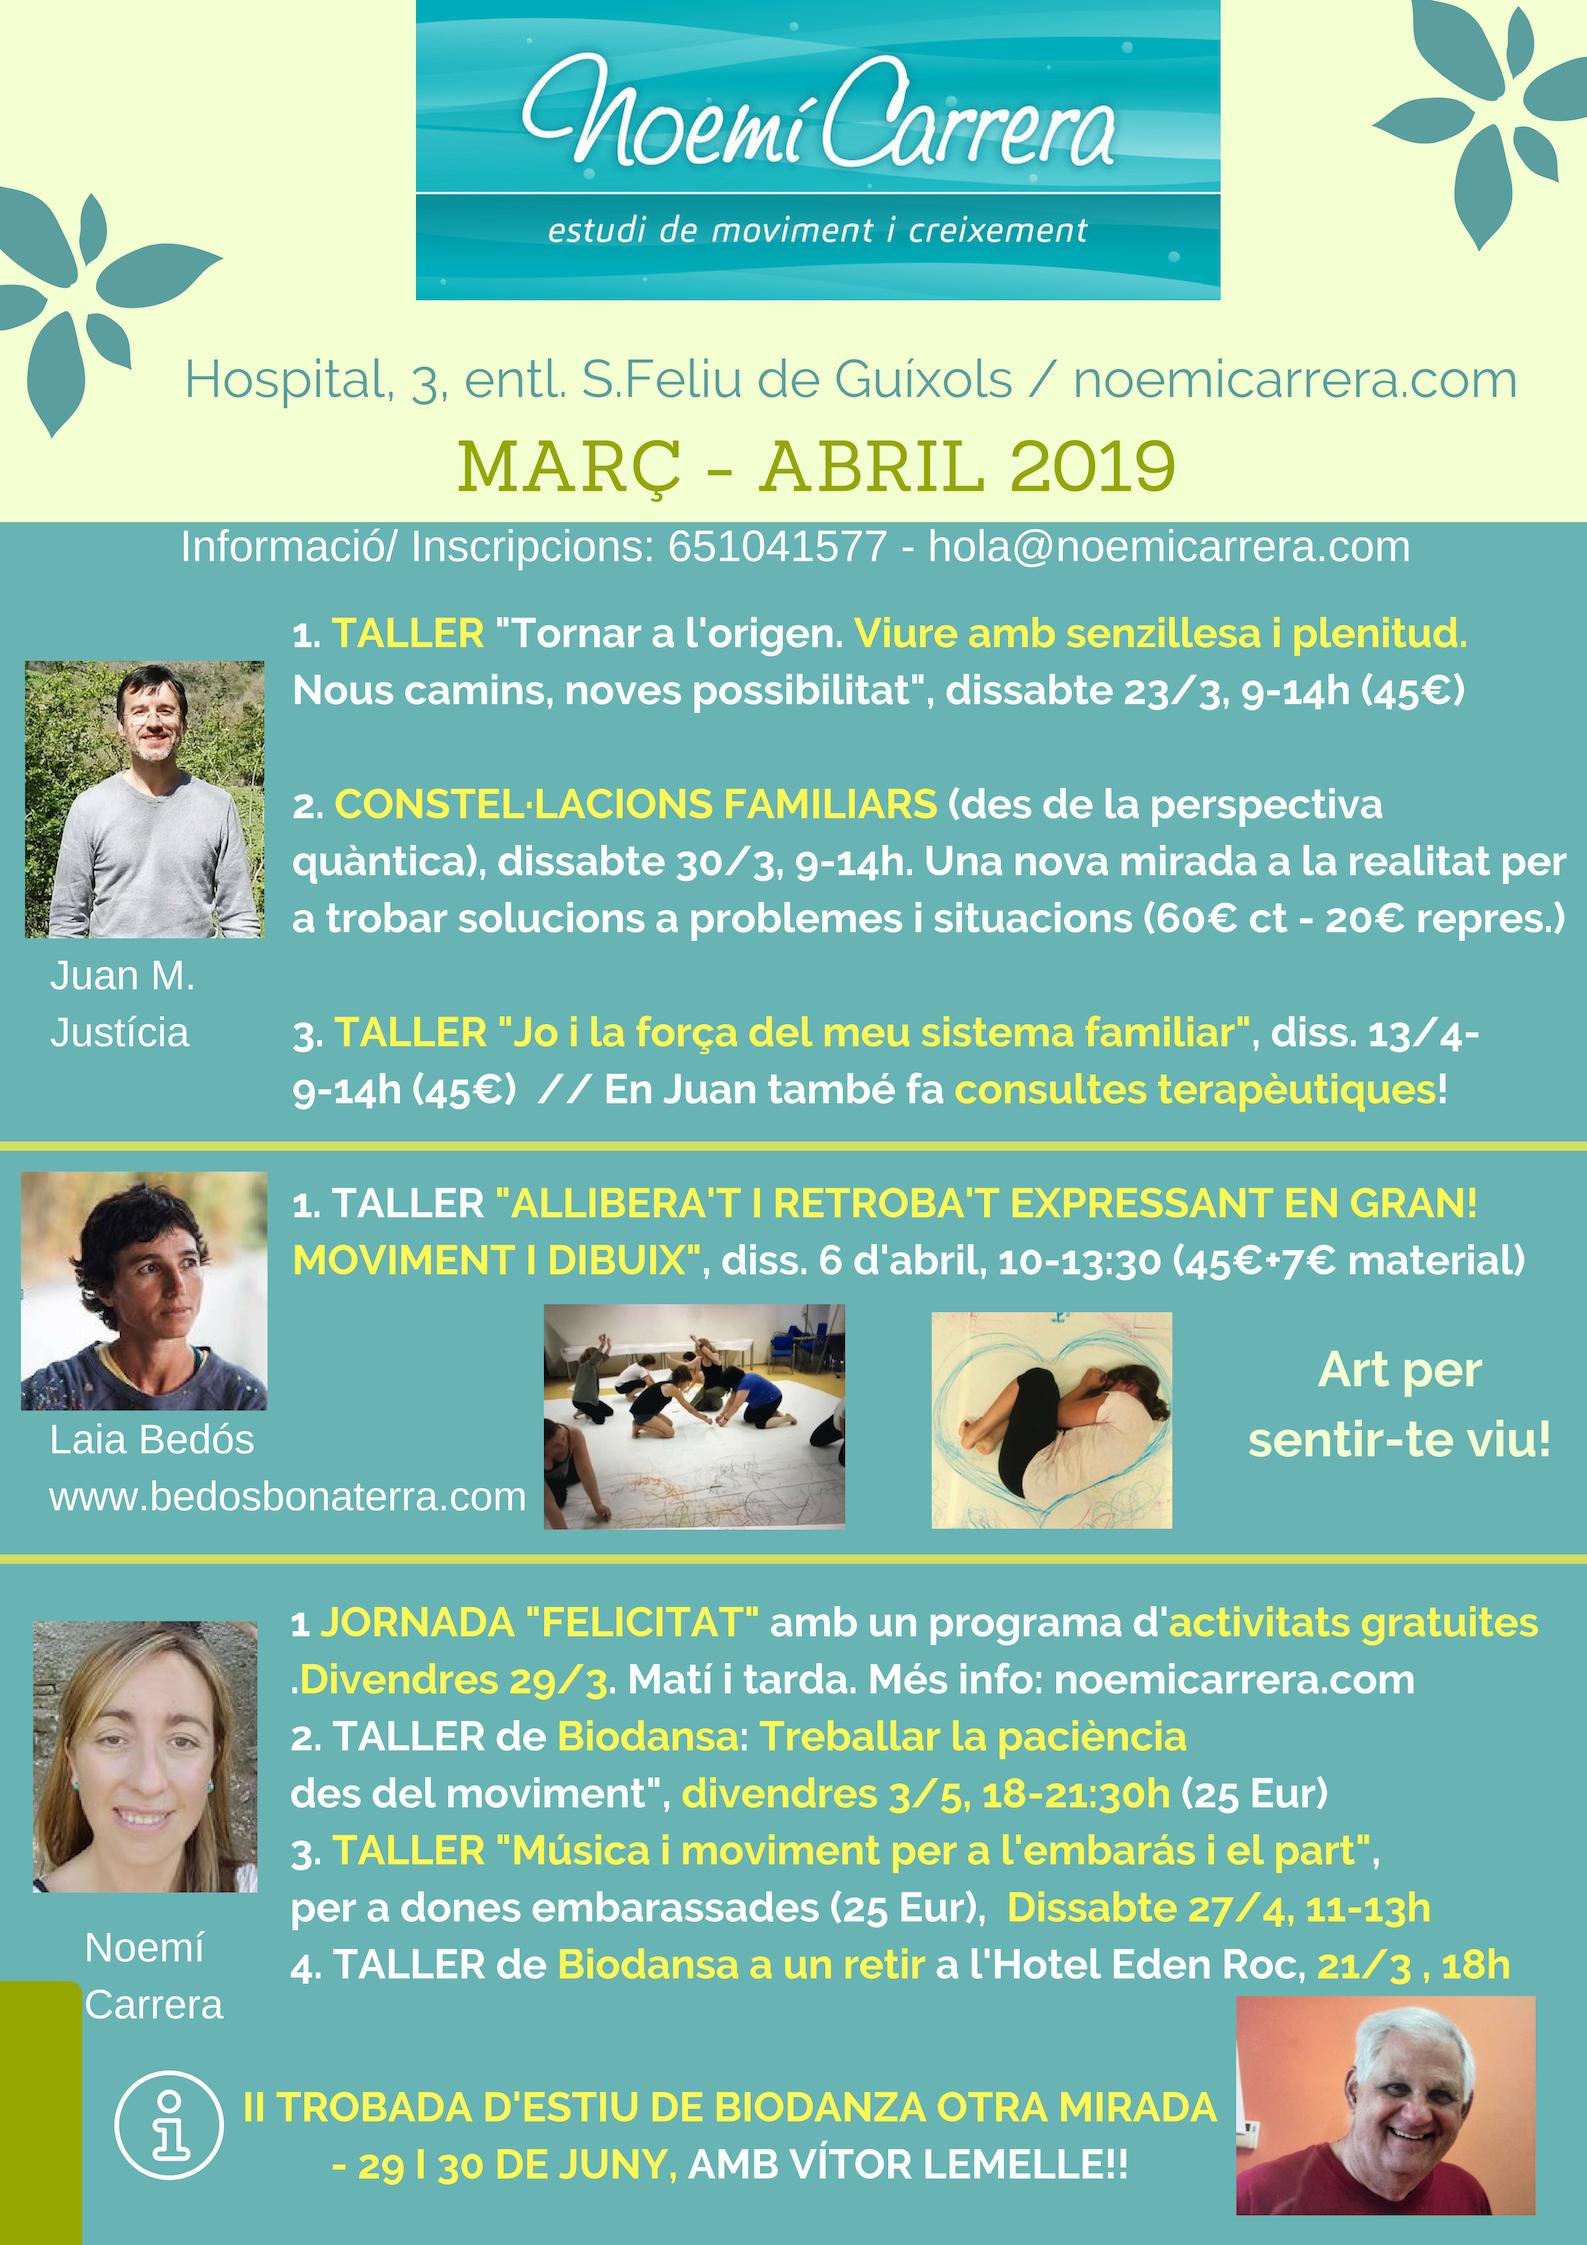 Noemí Carrera Biodanza Març Abril